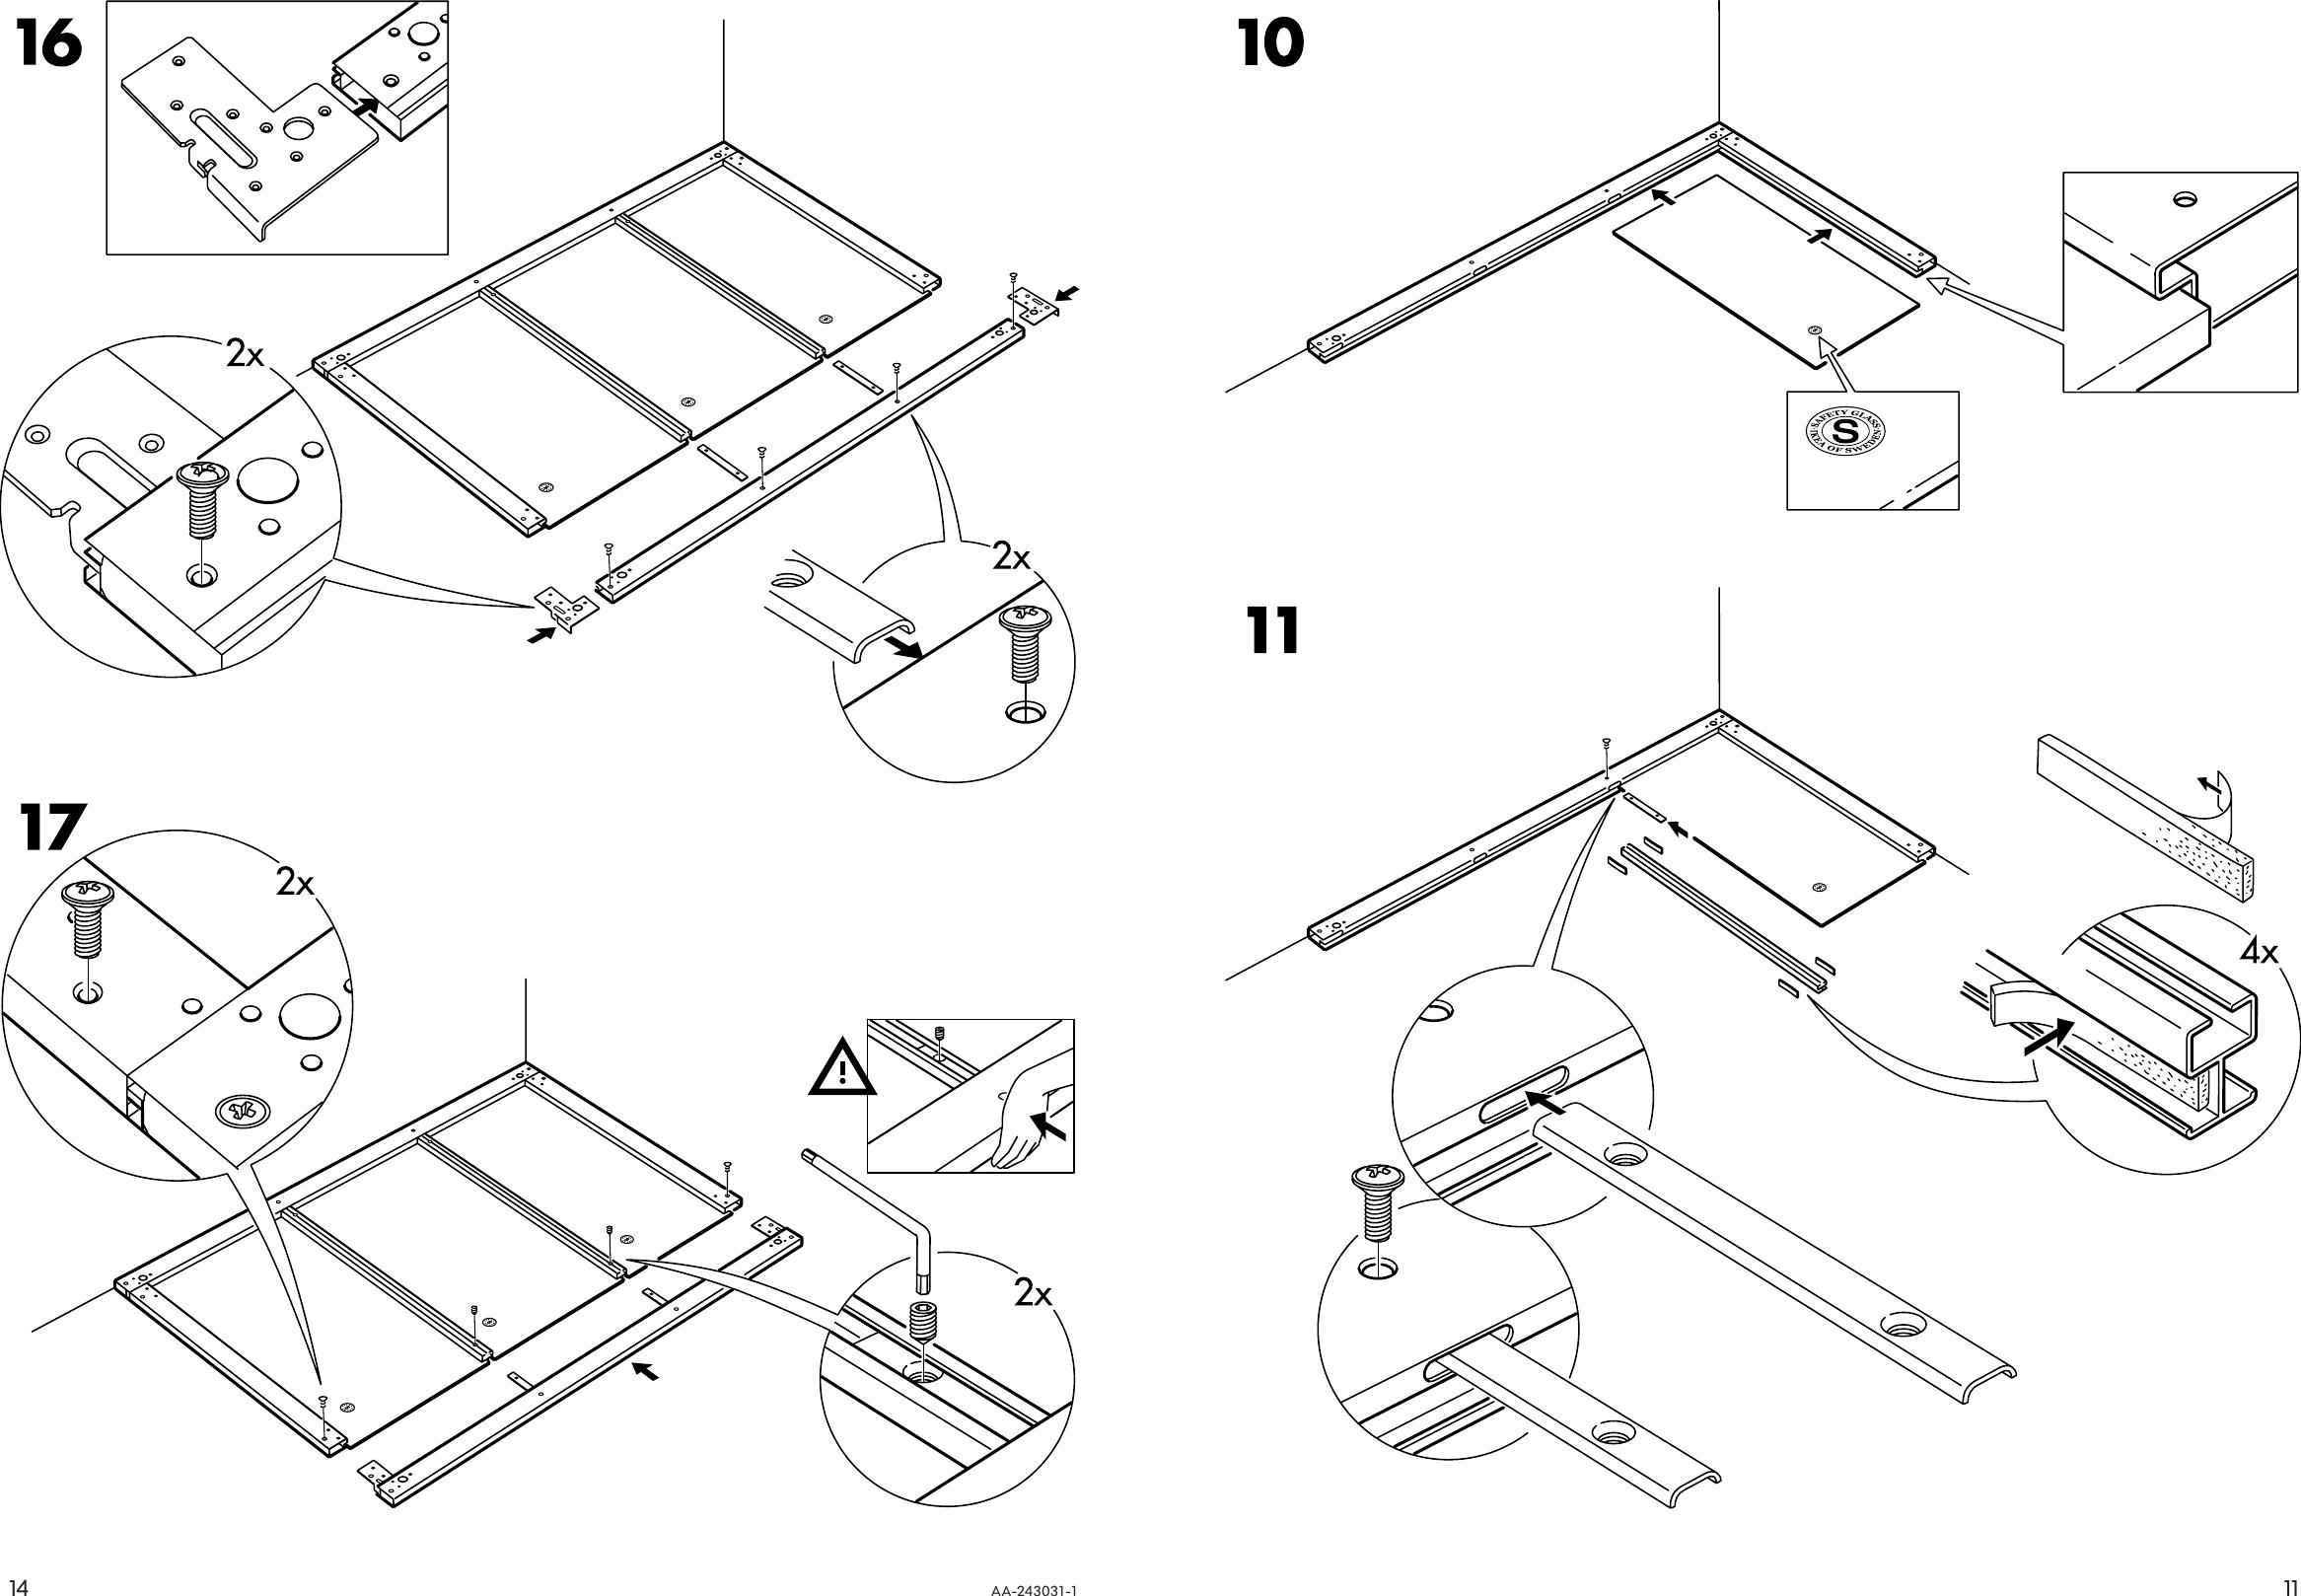 Ikea Pax Stordal Sliding Door Pair 98x93 Assembly Instruction